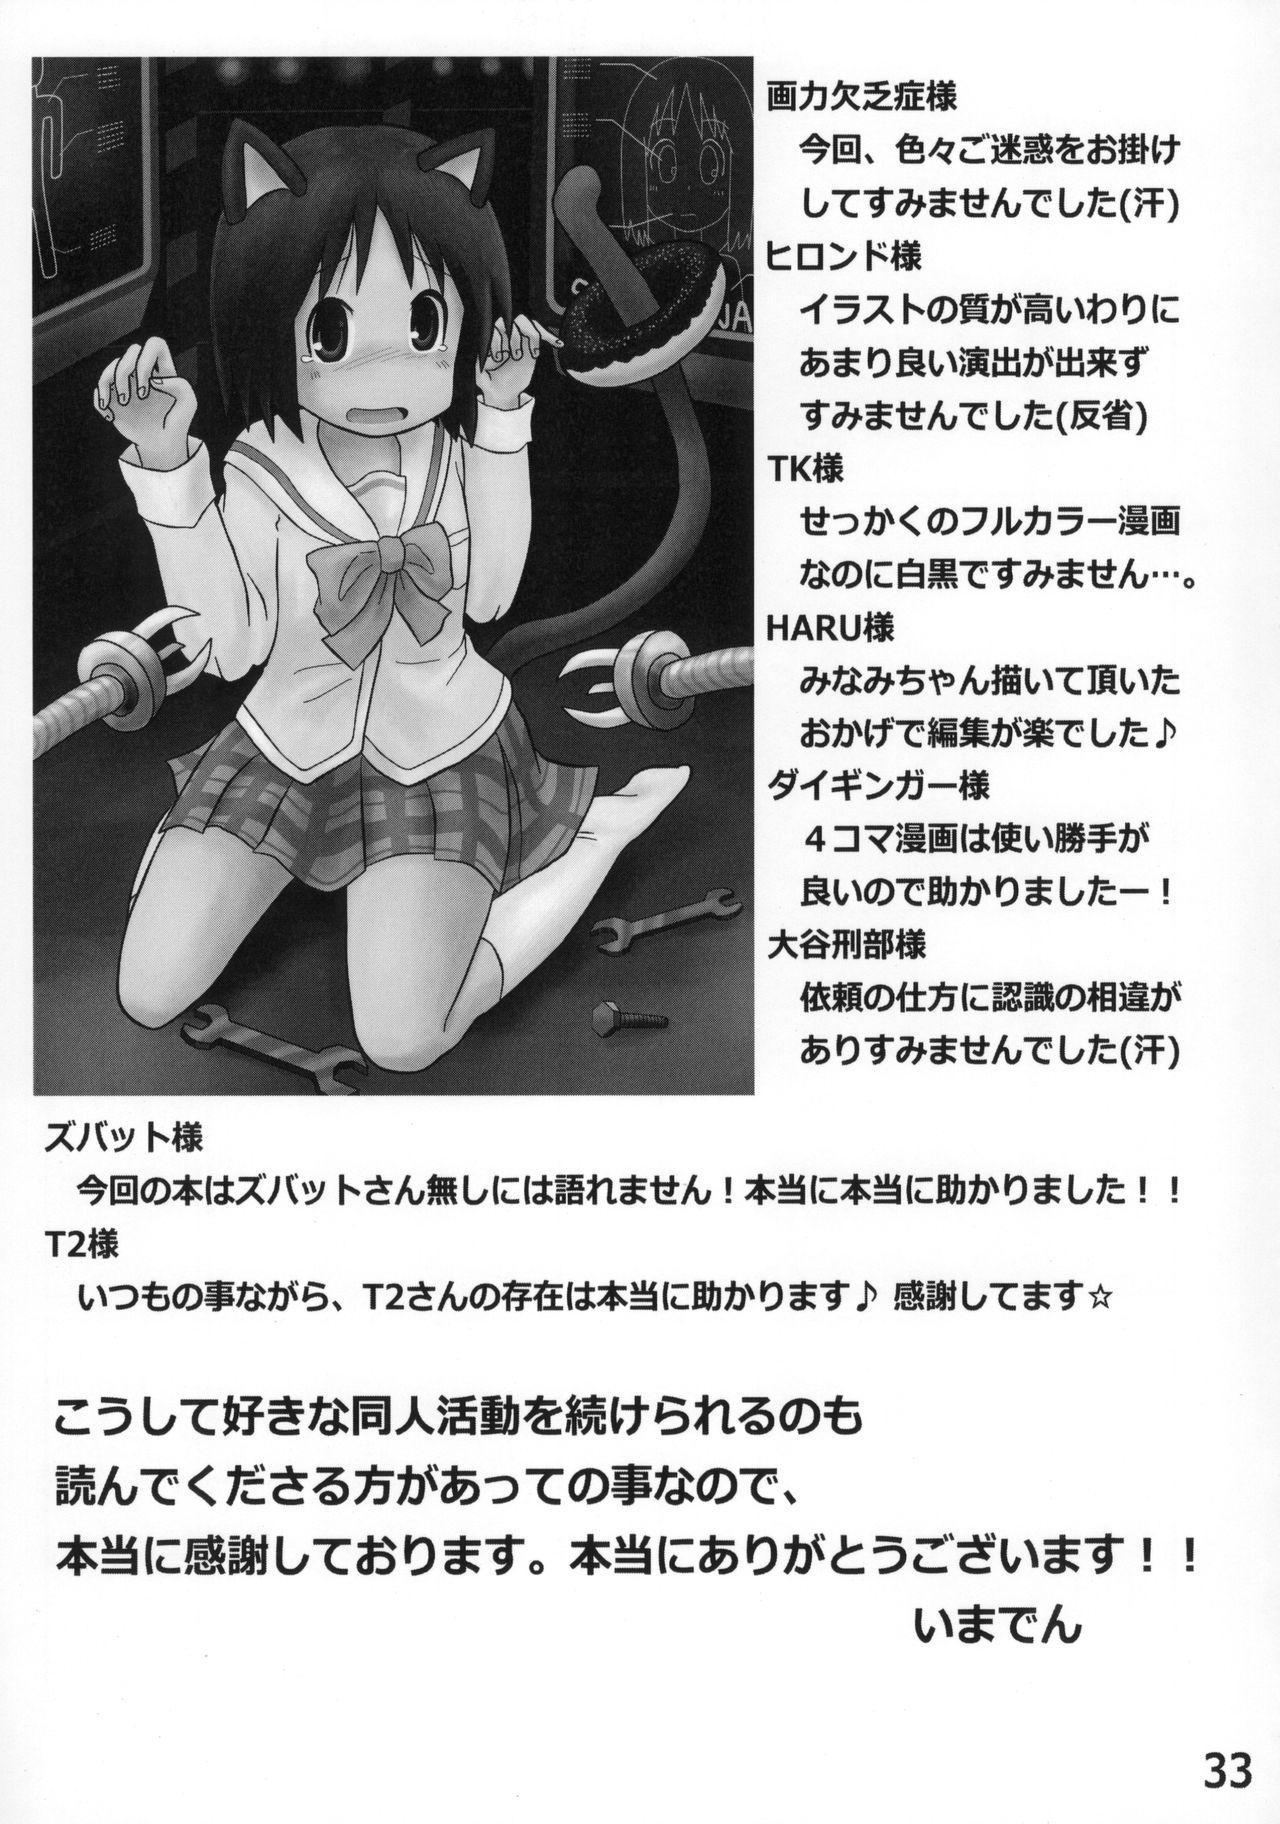 Lucky-jou Pantsu Hunter Vol. 2 31